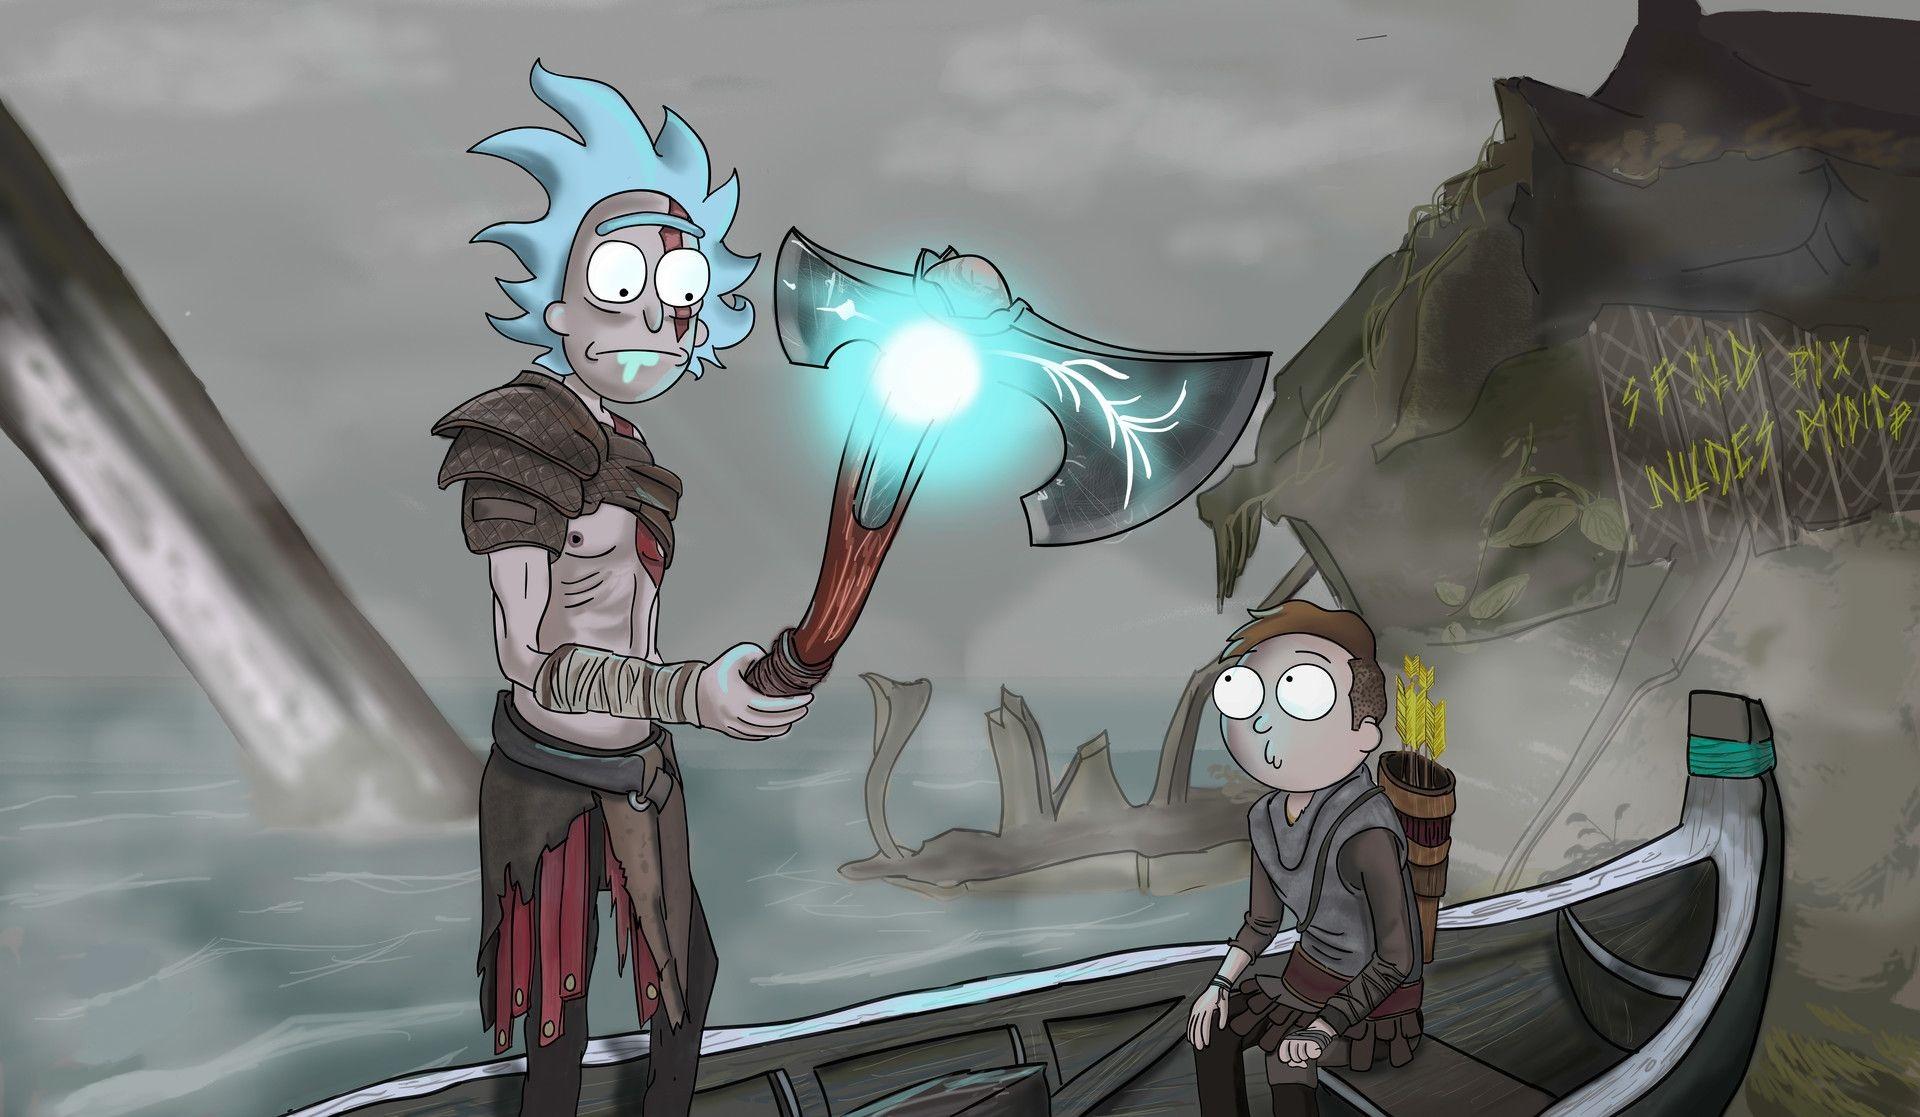 Wallpaper God Of War Fan Art Rick And Morty Drawing